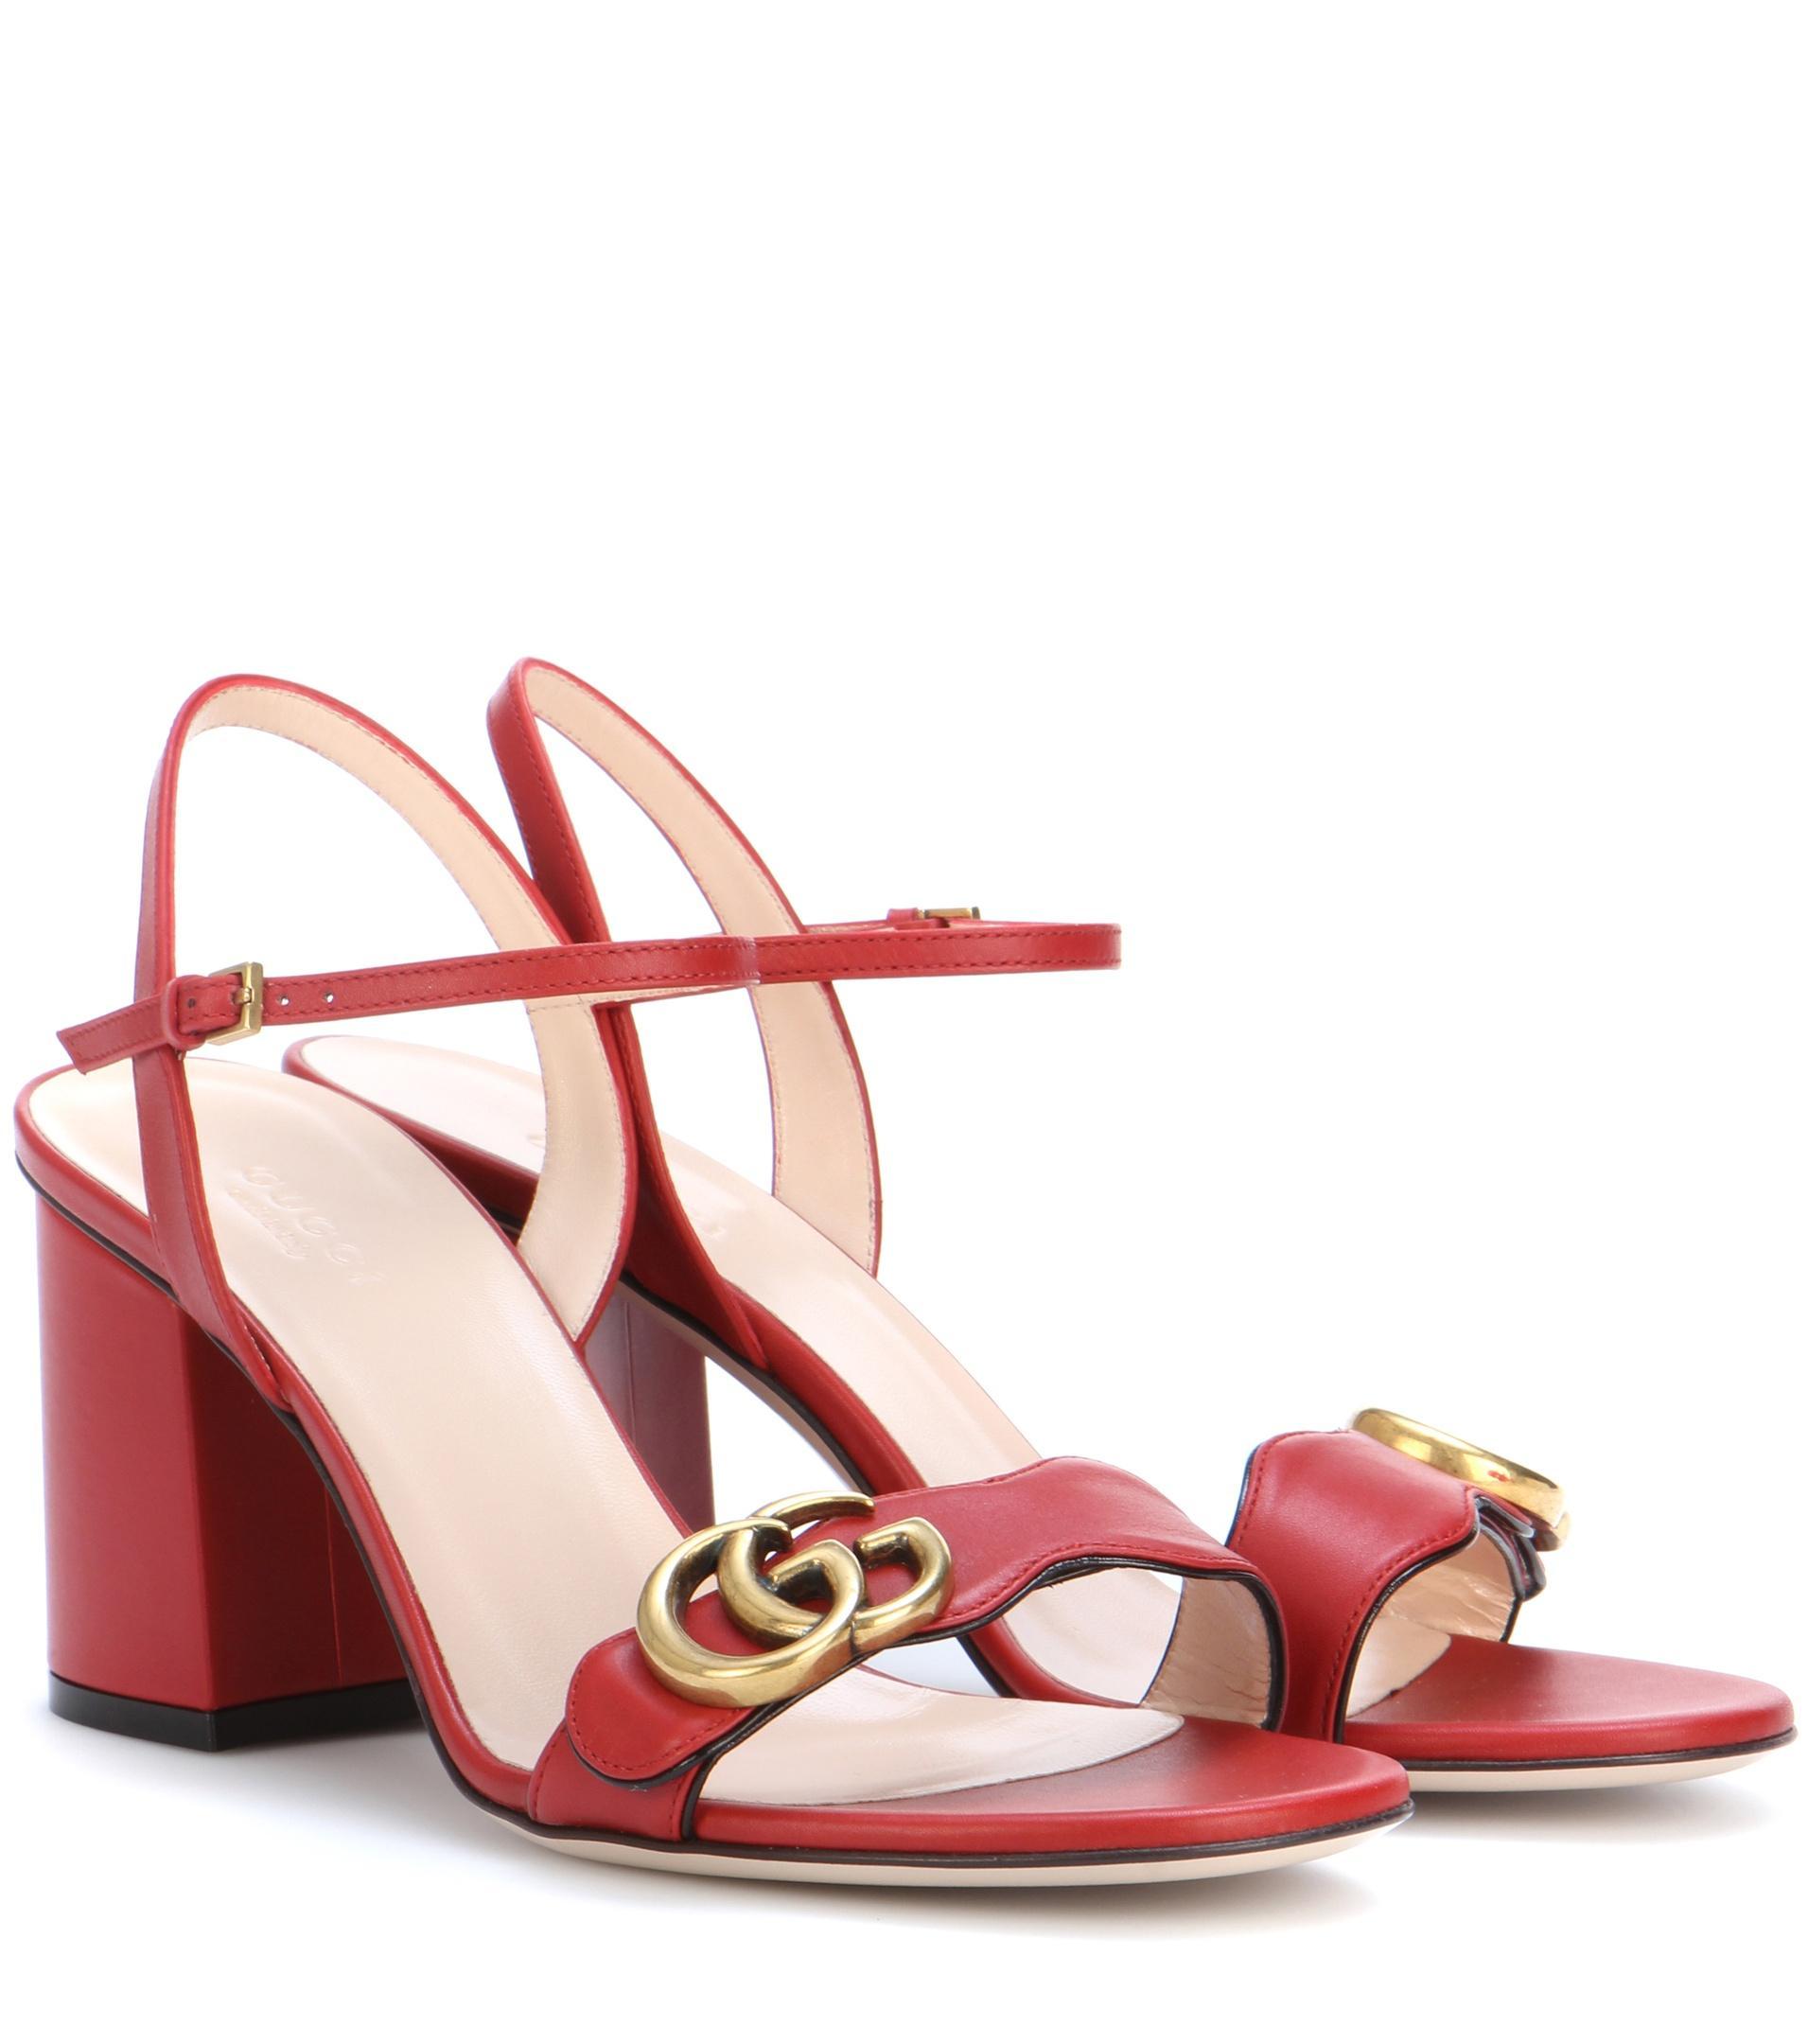 fde38d786fa Gucci Webby Sandal Sale.Gucci Webby Galvanized Heel Leather Mule ...